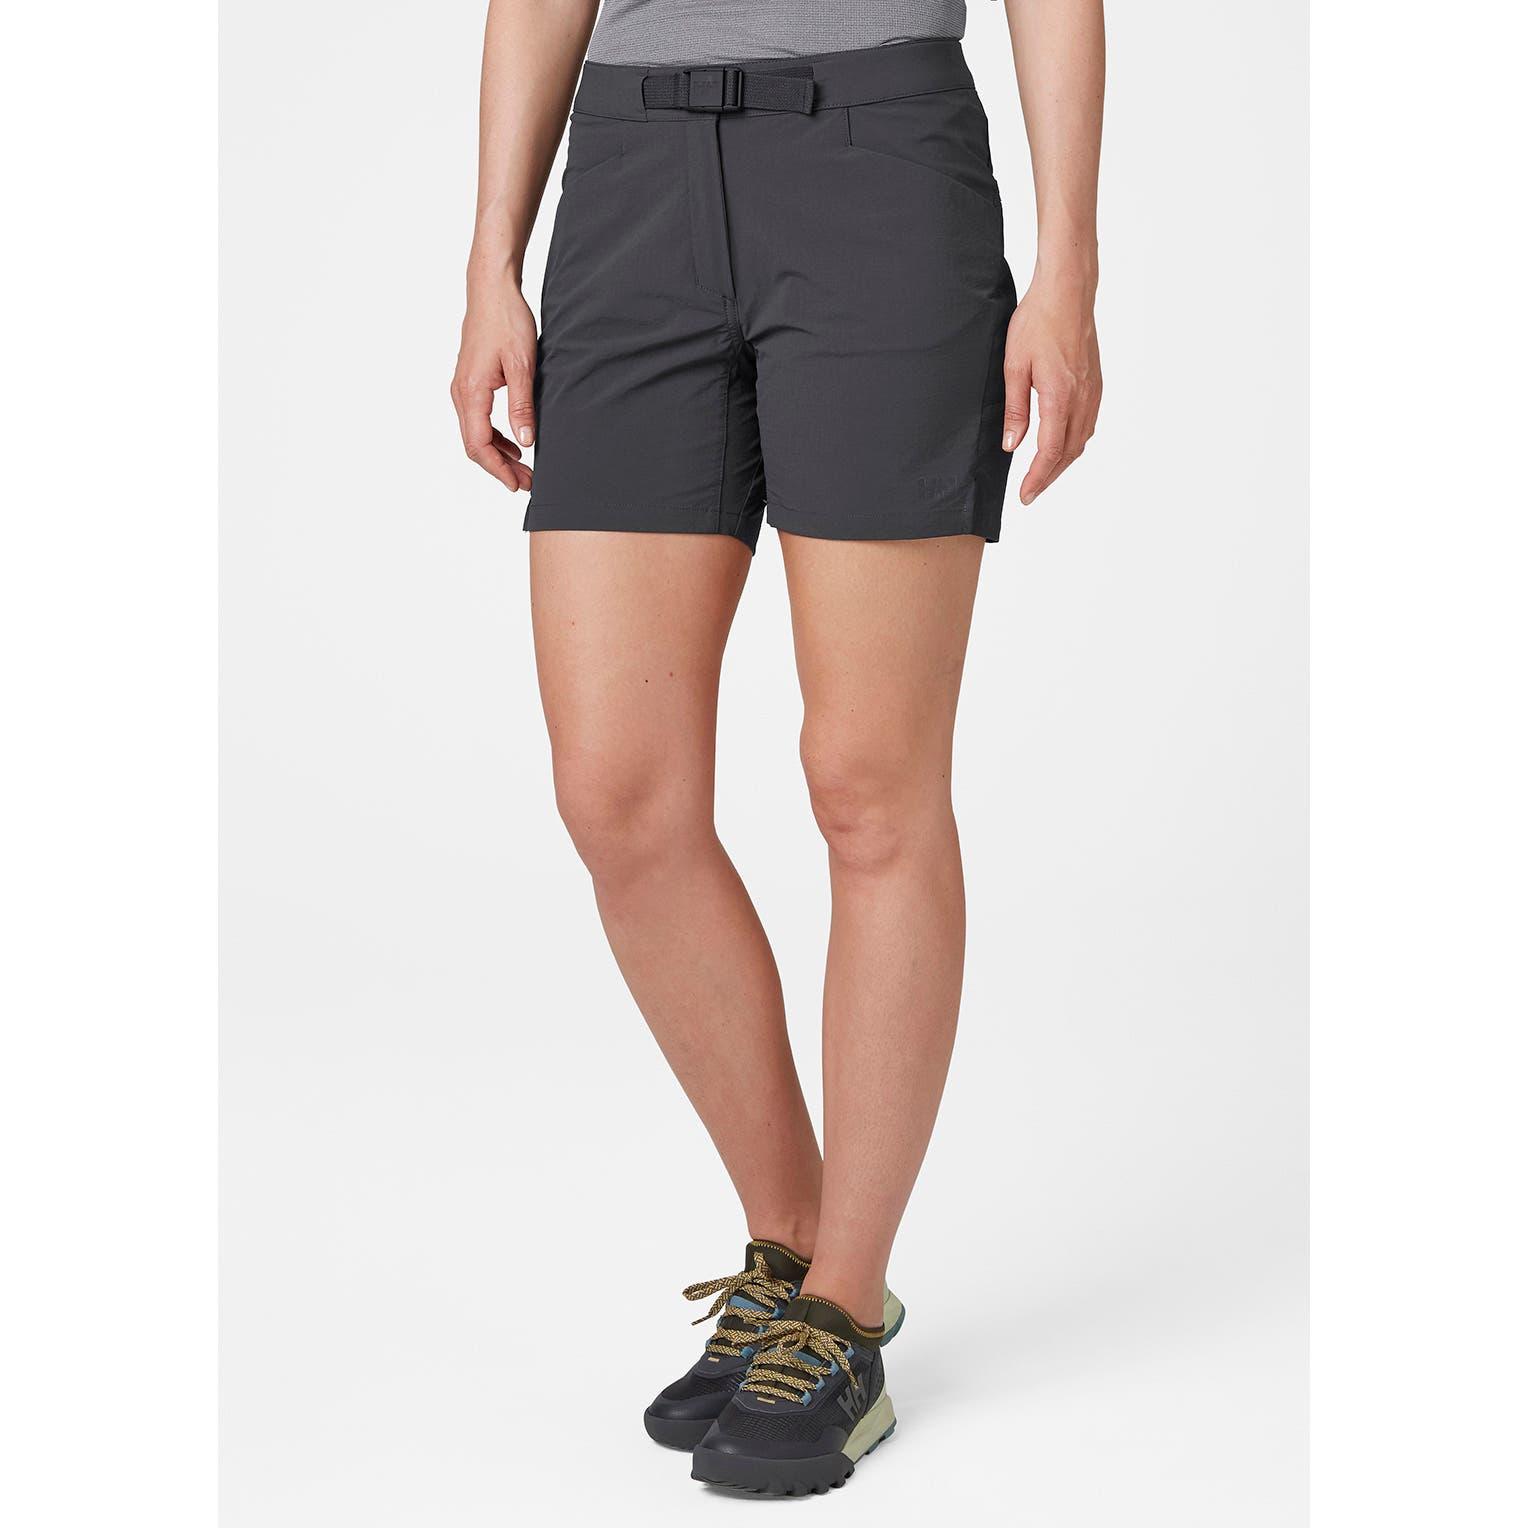 Helly Hansen Tinden Light Shorts, dame